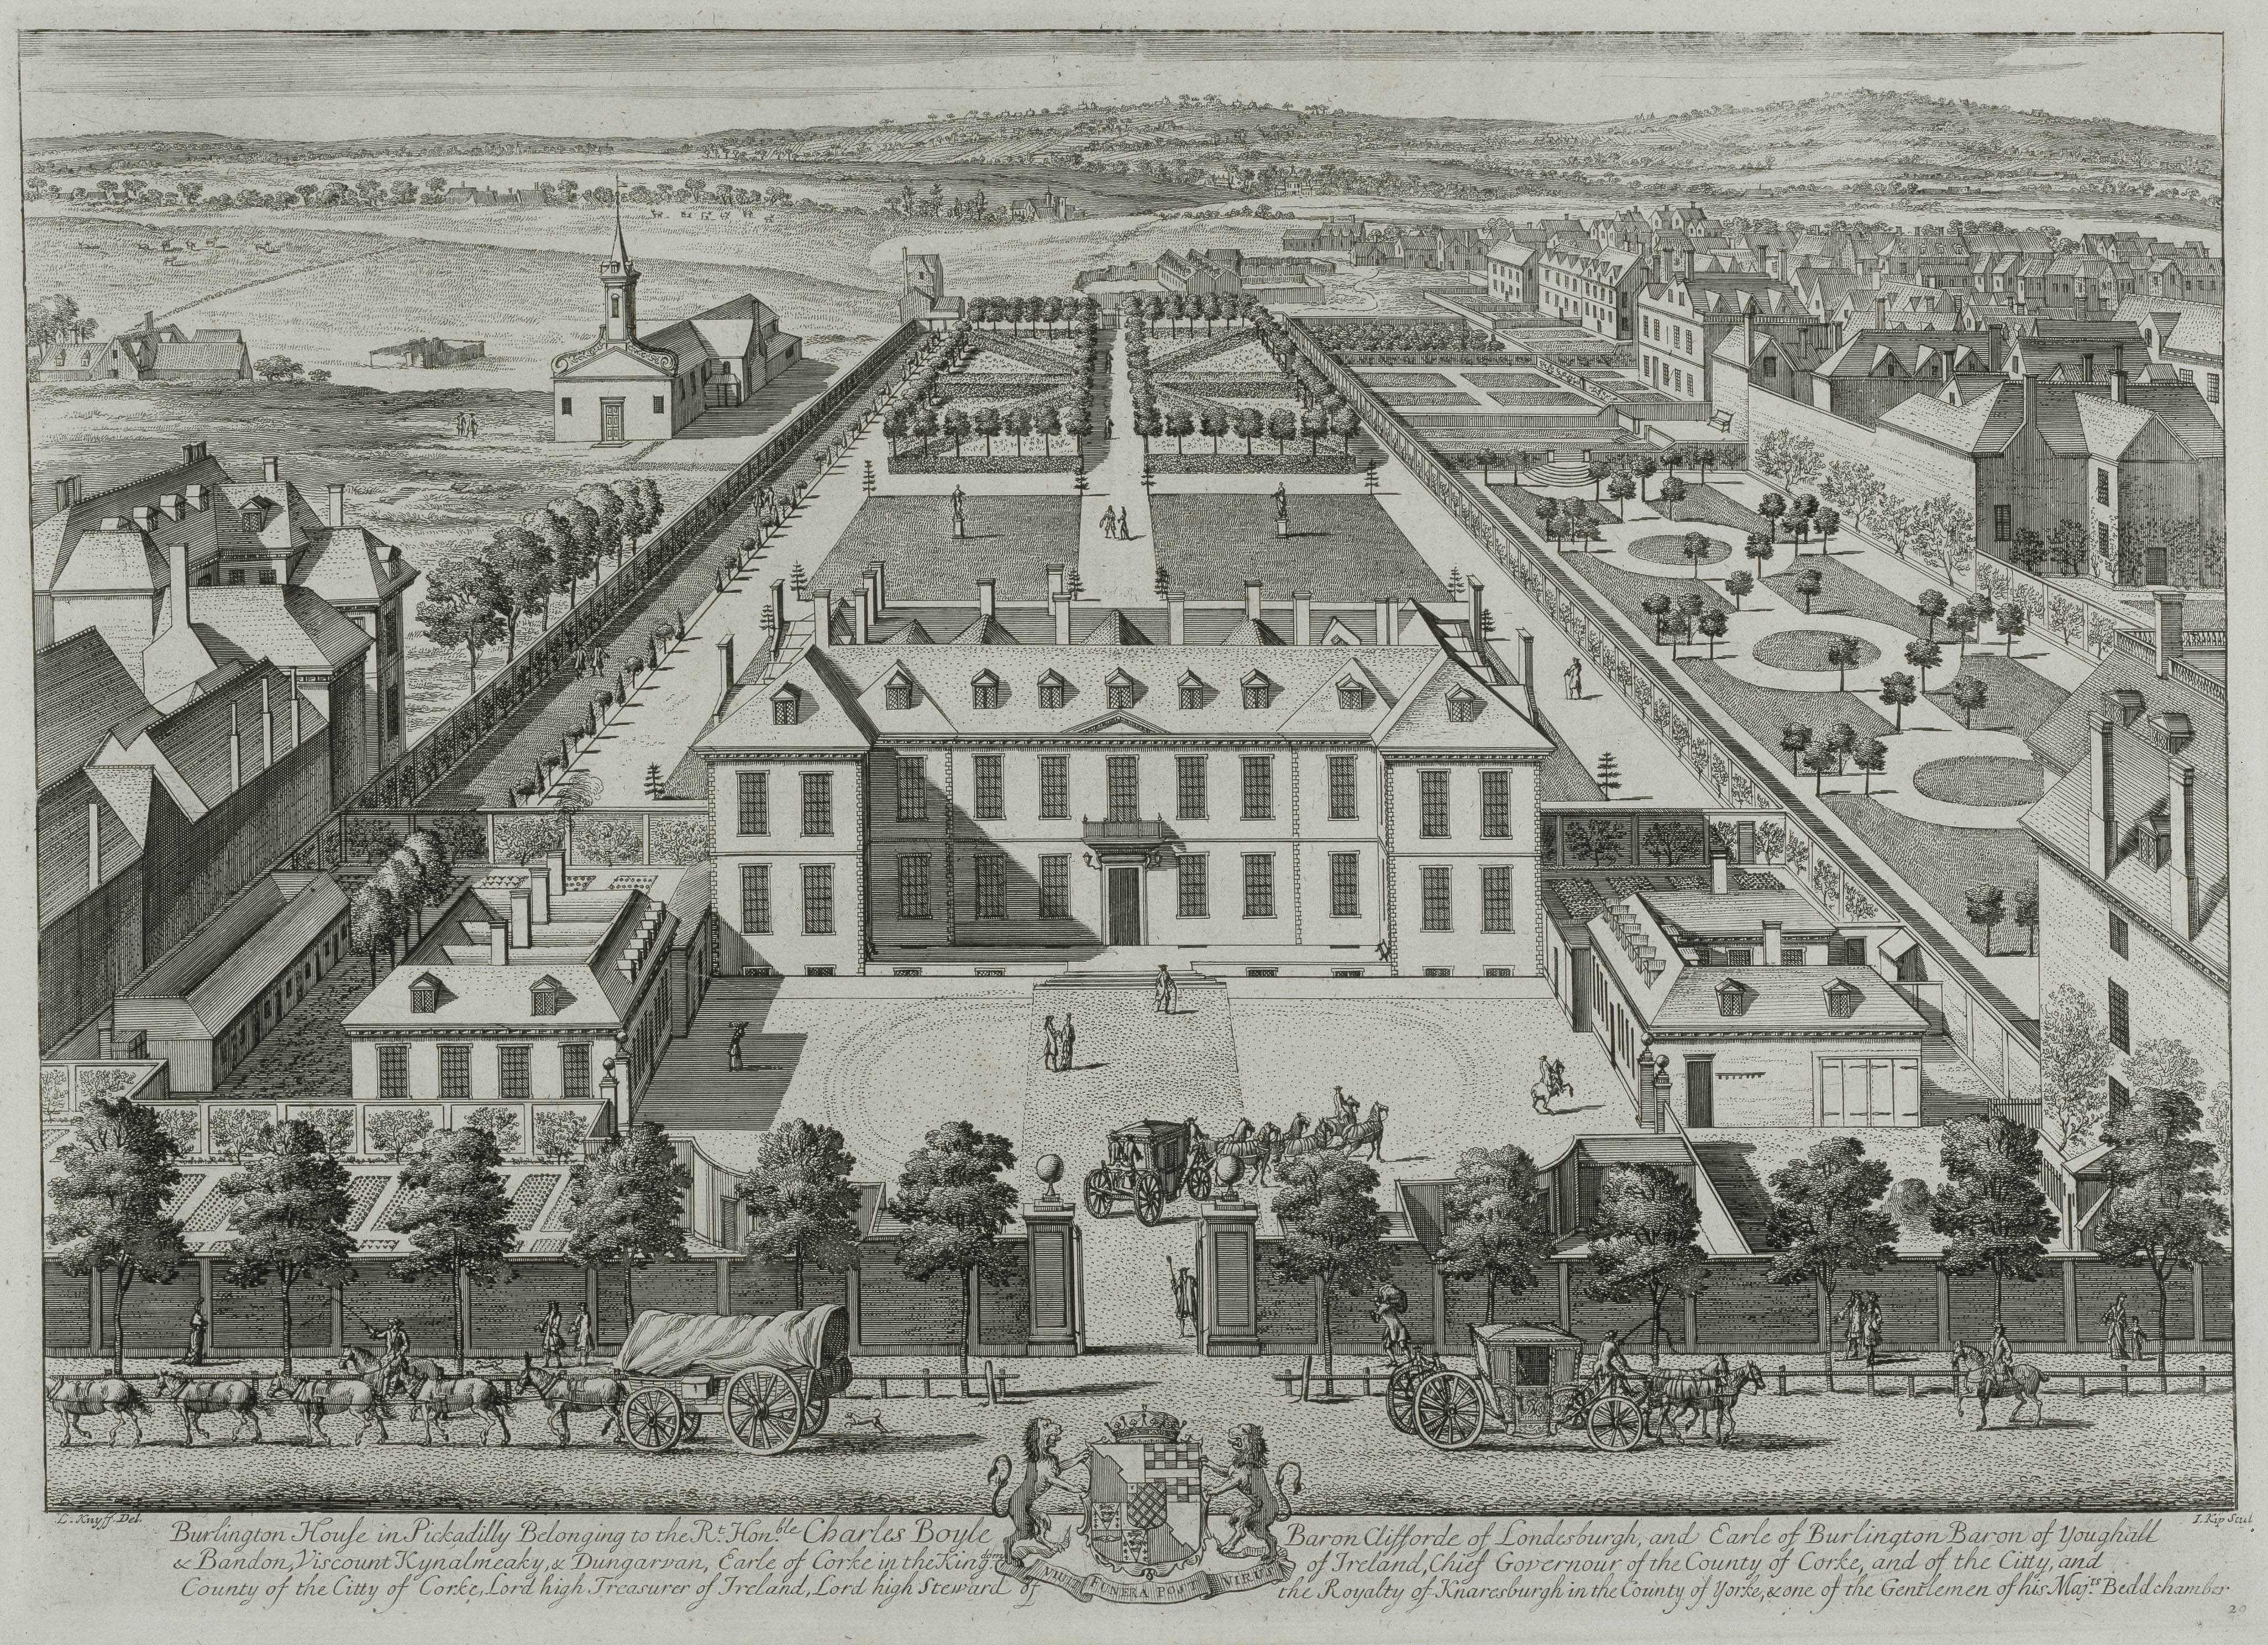 Burlington house in Pickadilly London, 1715